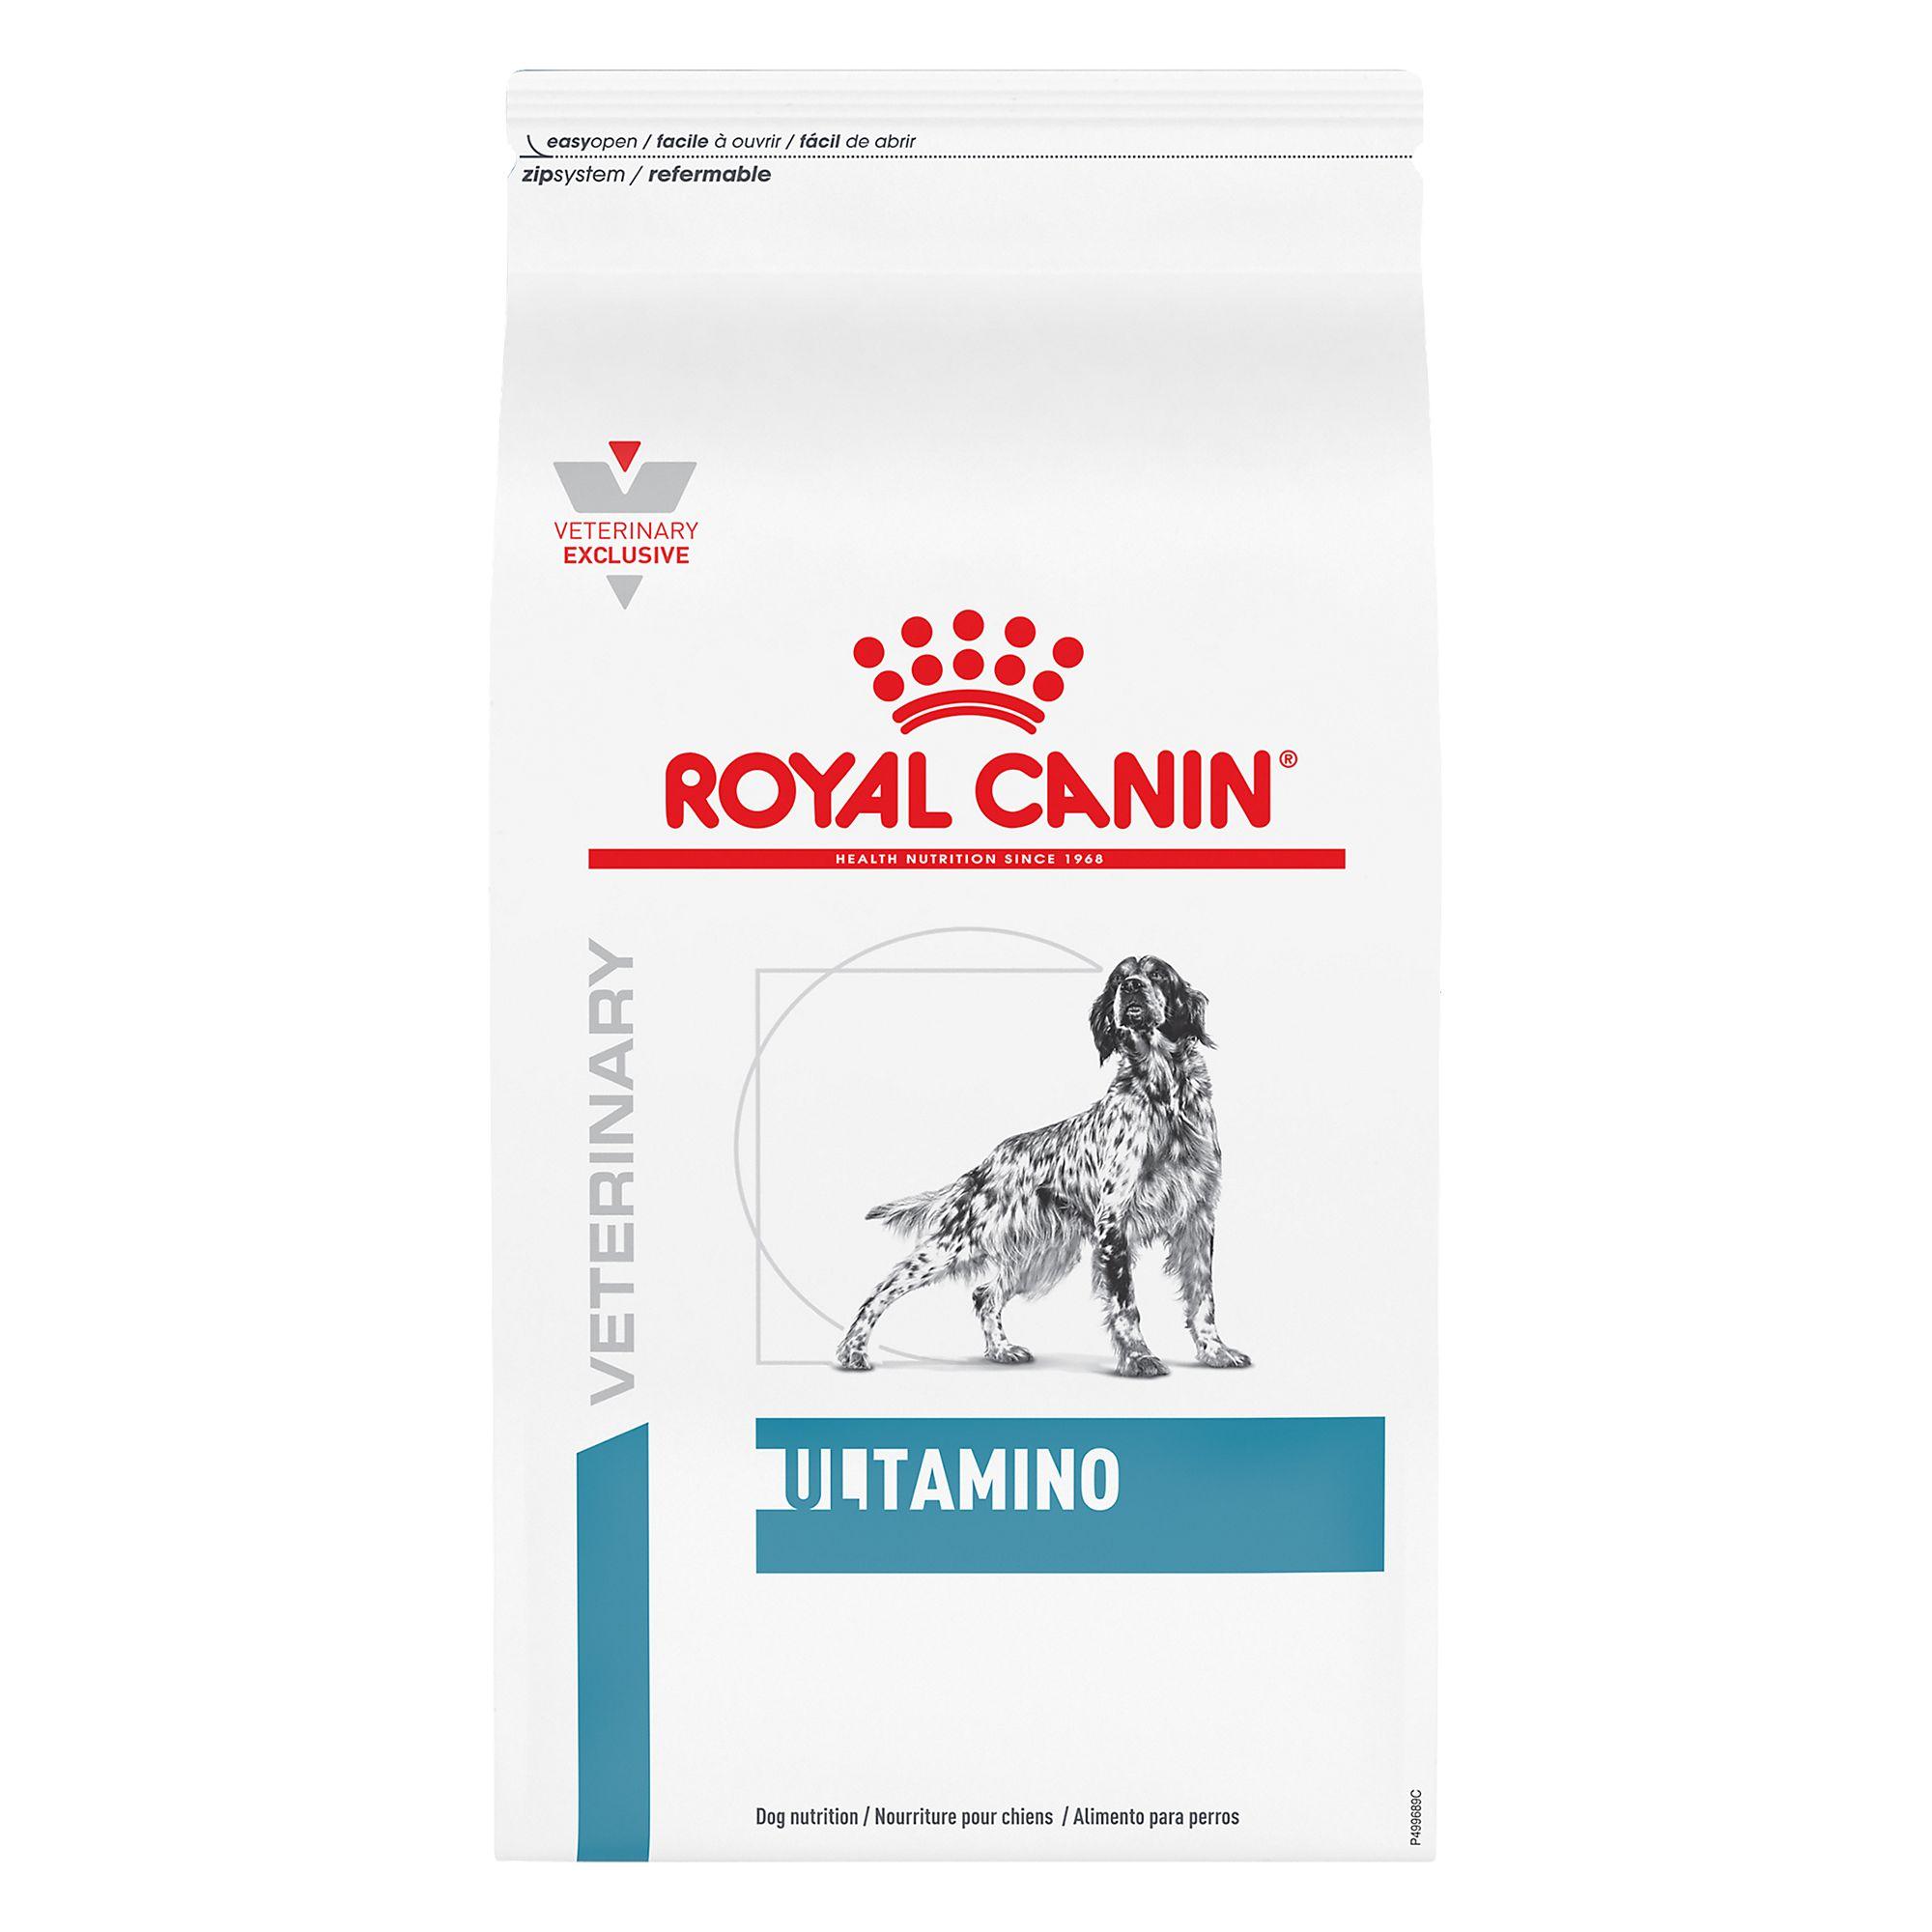 Peerage Canin Veterinary Diet Ultamino Dog Food size: 8.8 Lb, Kibble, Adult